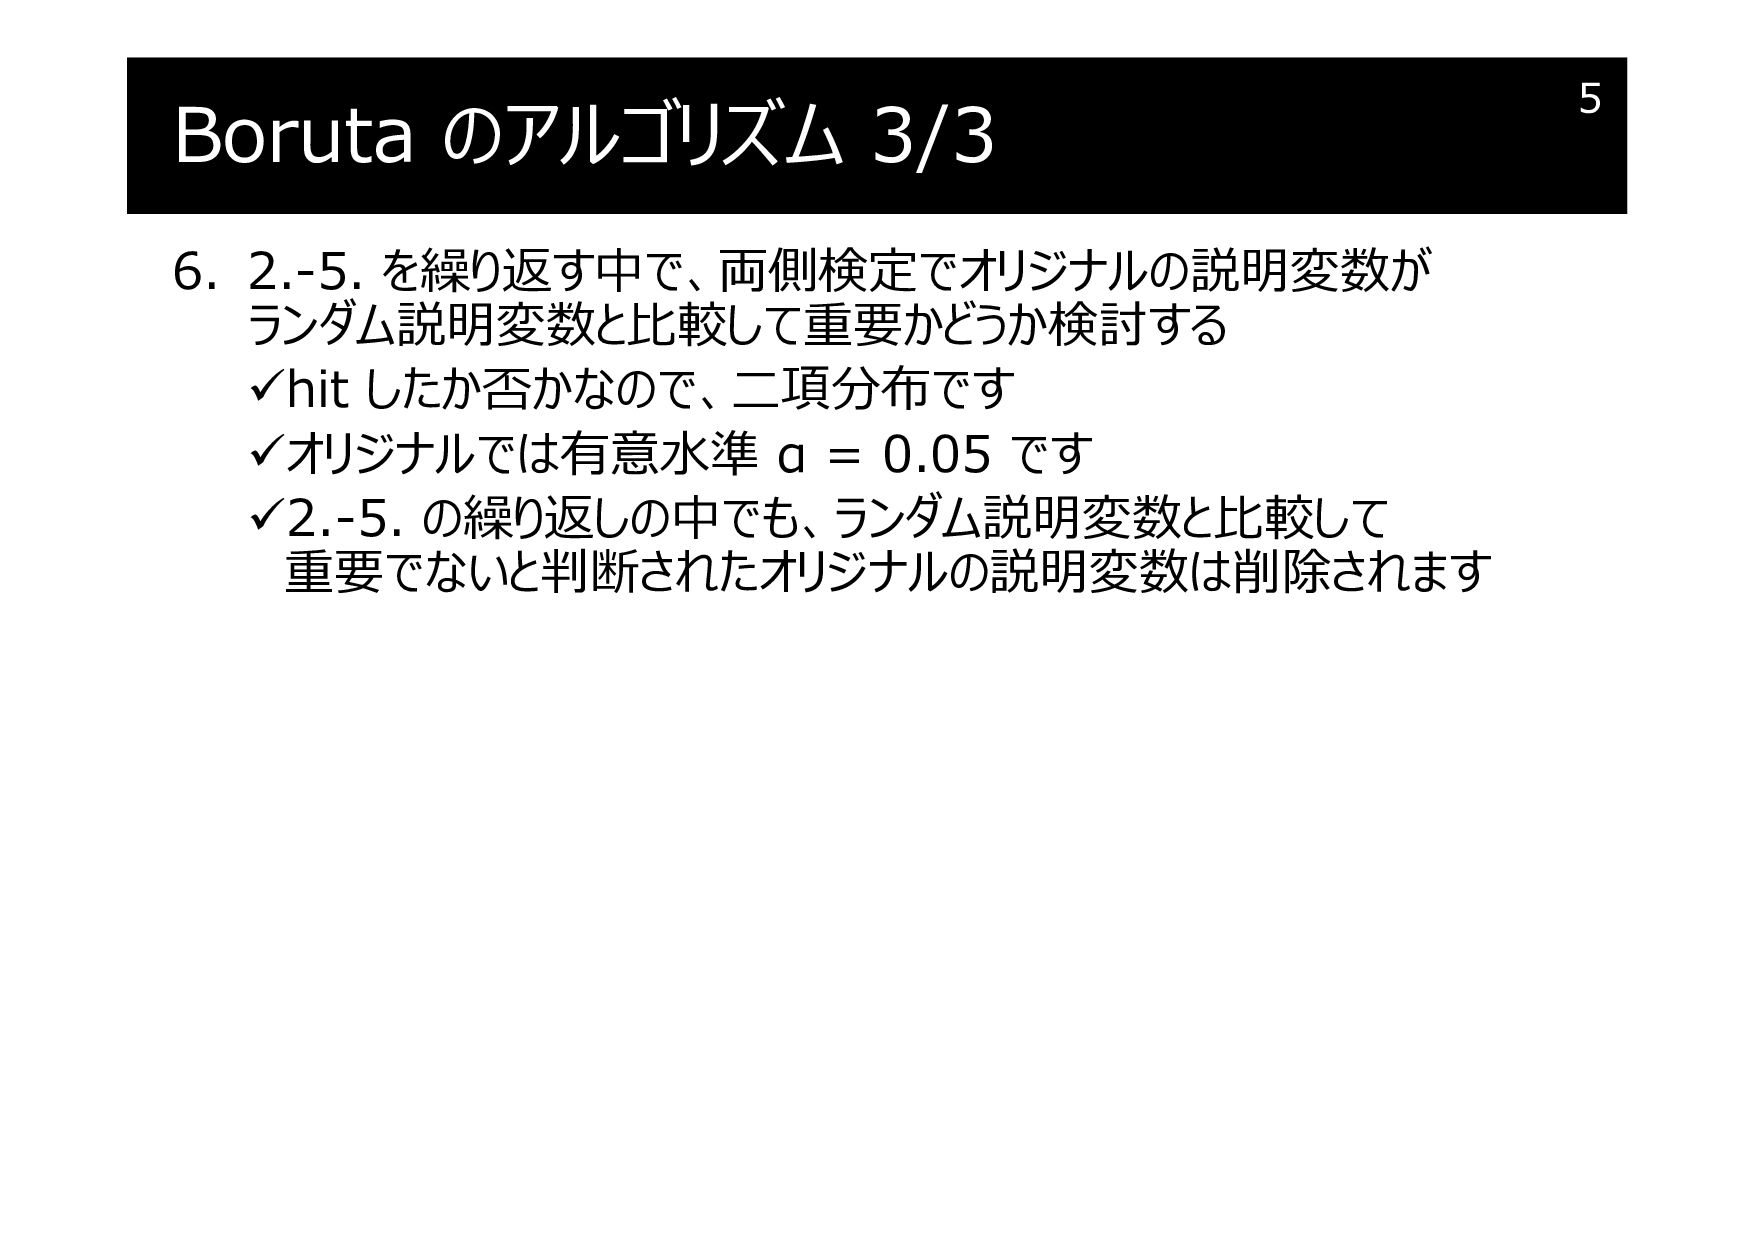 Boruta のアルゴリズム 3/3 6. 3.-5. を繰り返す中で、両側検定でオリジナルの...